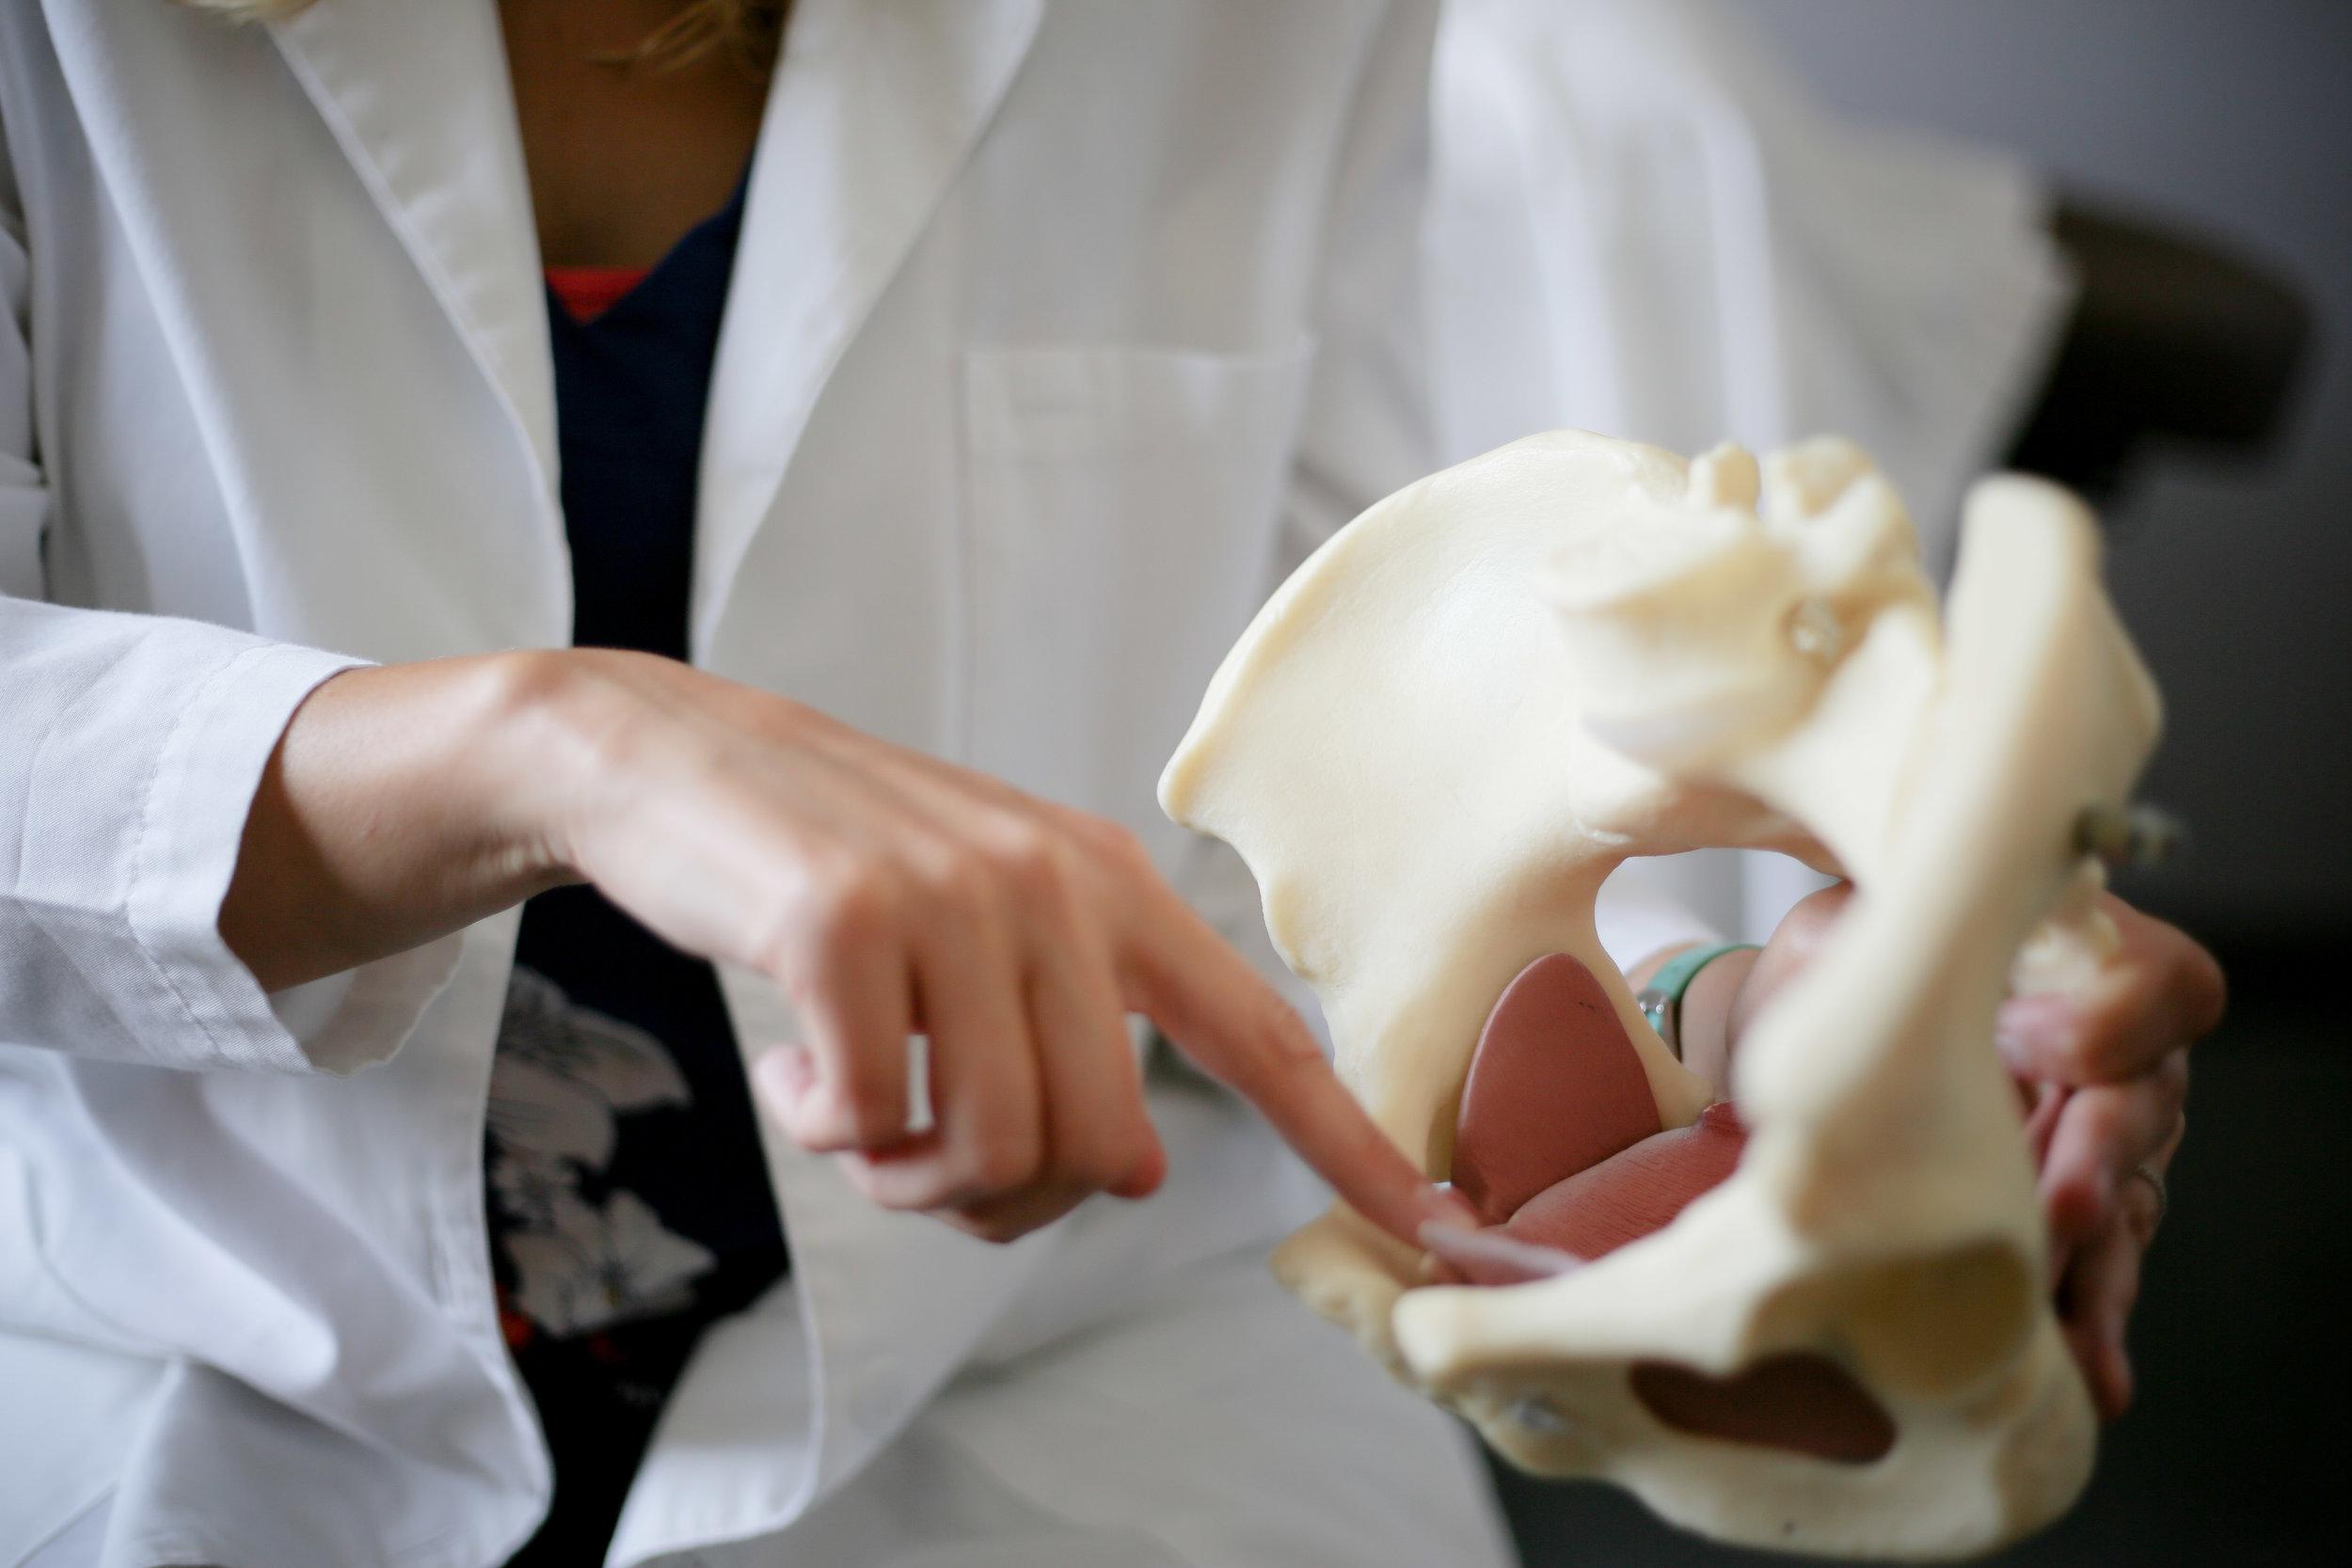 5 essential functions of the pelvic floor